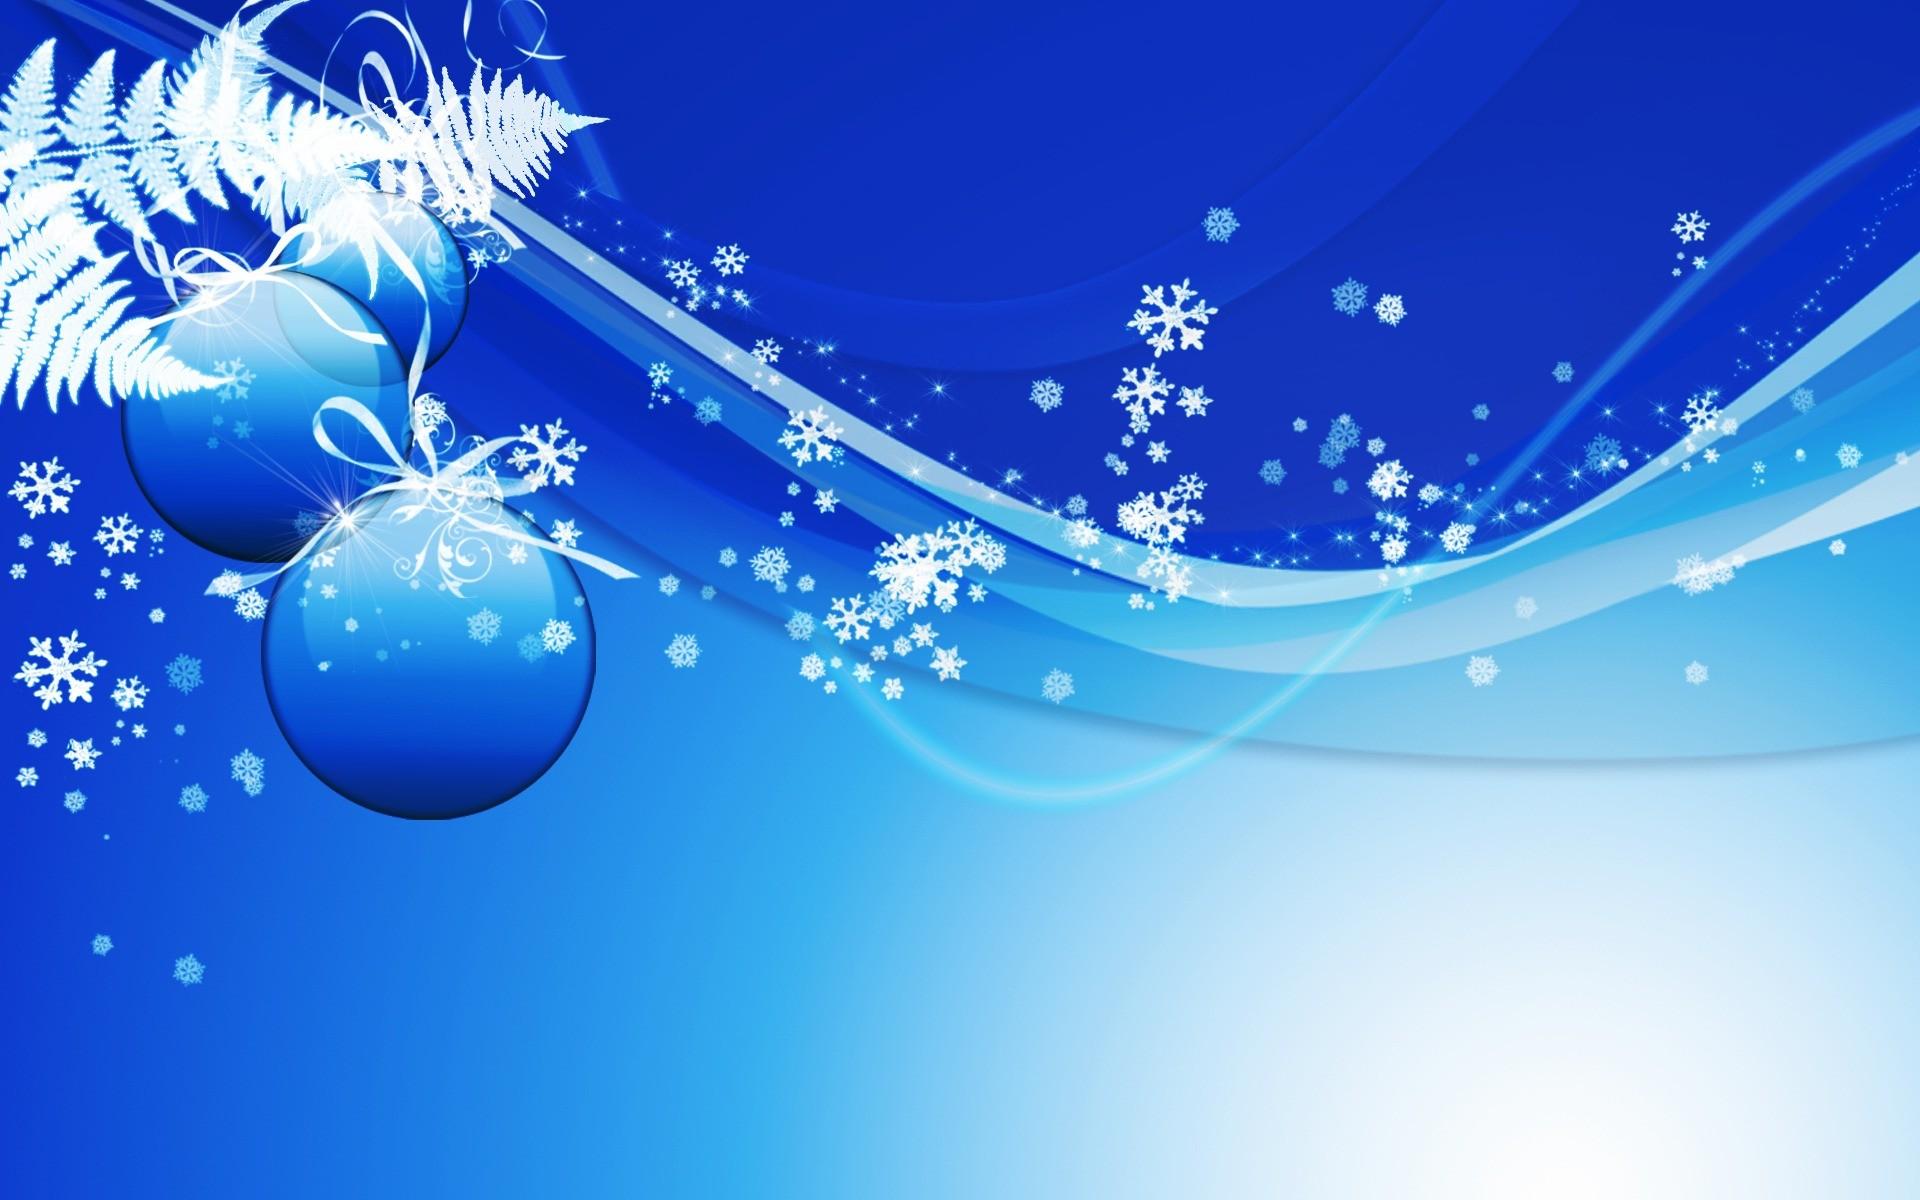 christmas-free-wallpaper-by-Buntran